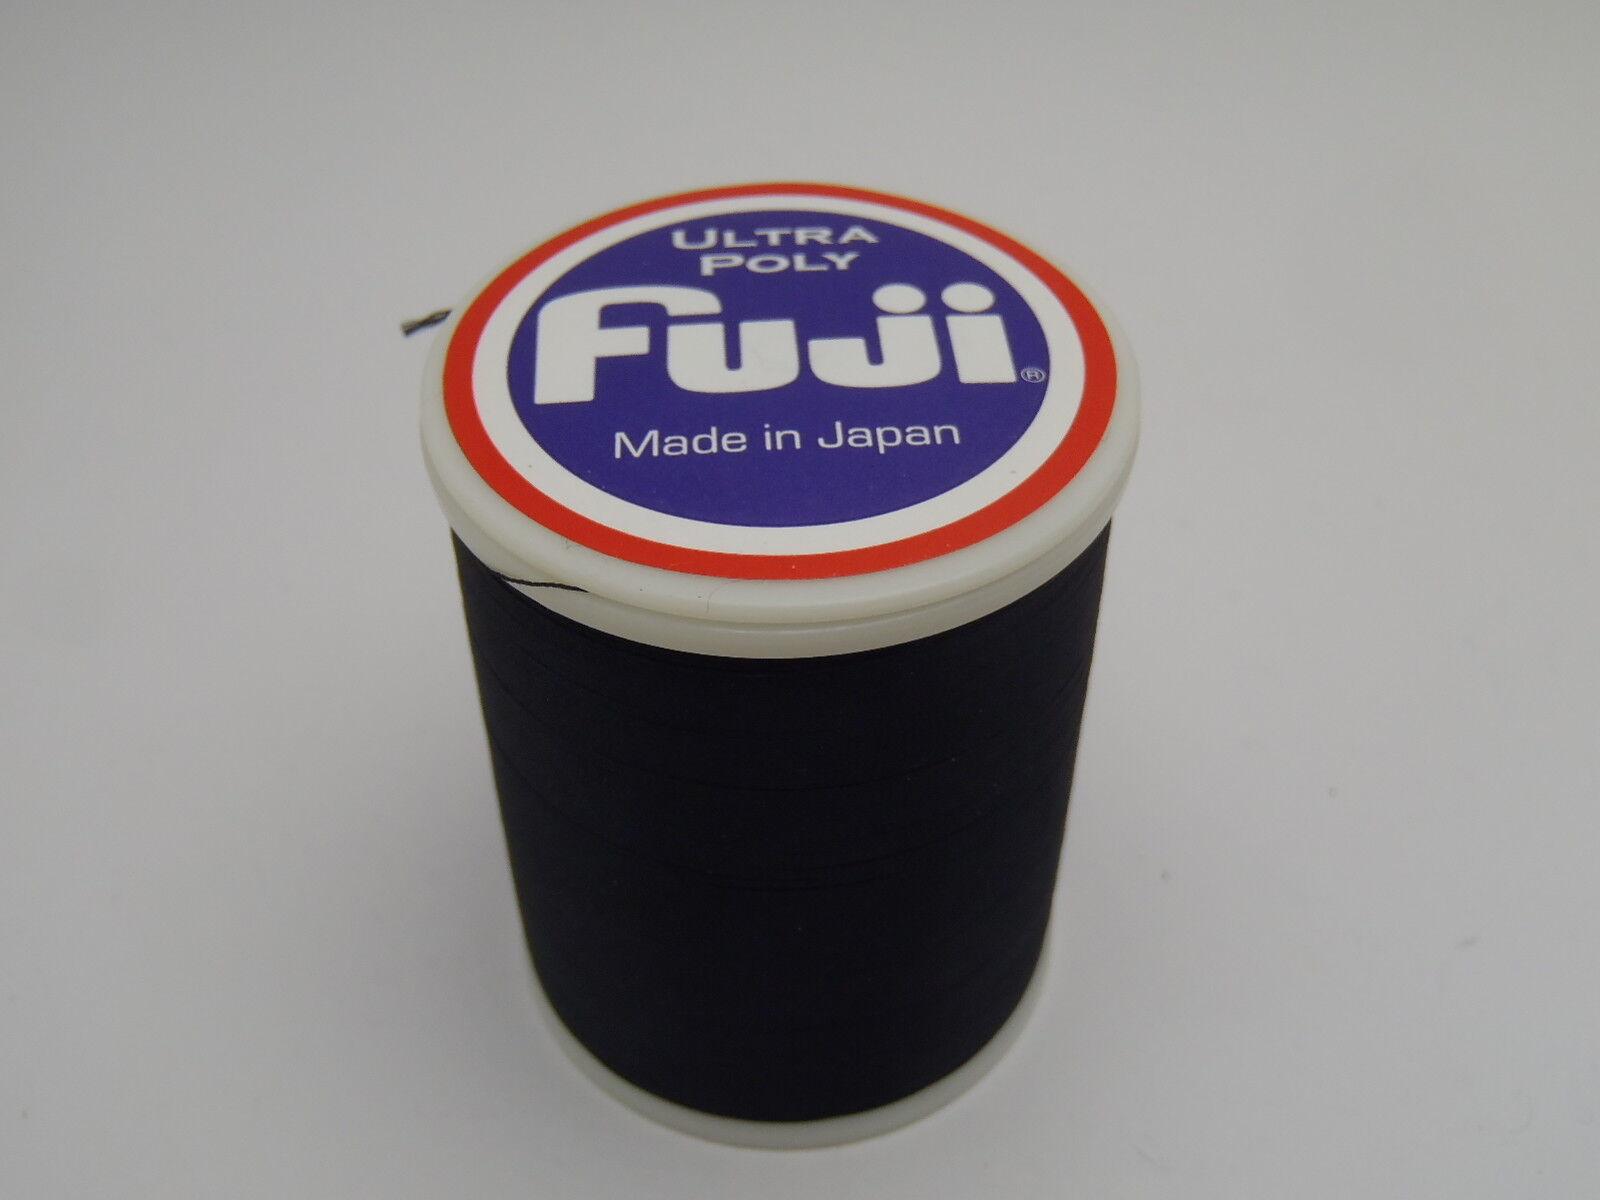 1pc Fuji Tackle Japan Ultra Poly Rod Binding 800m 1oz Bobbin Thread Choose Type